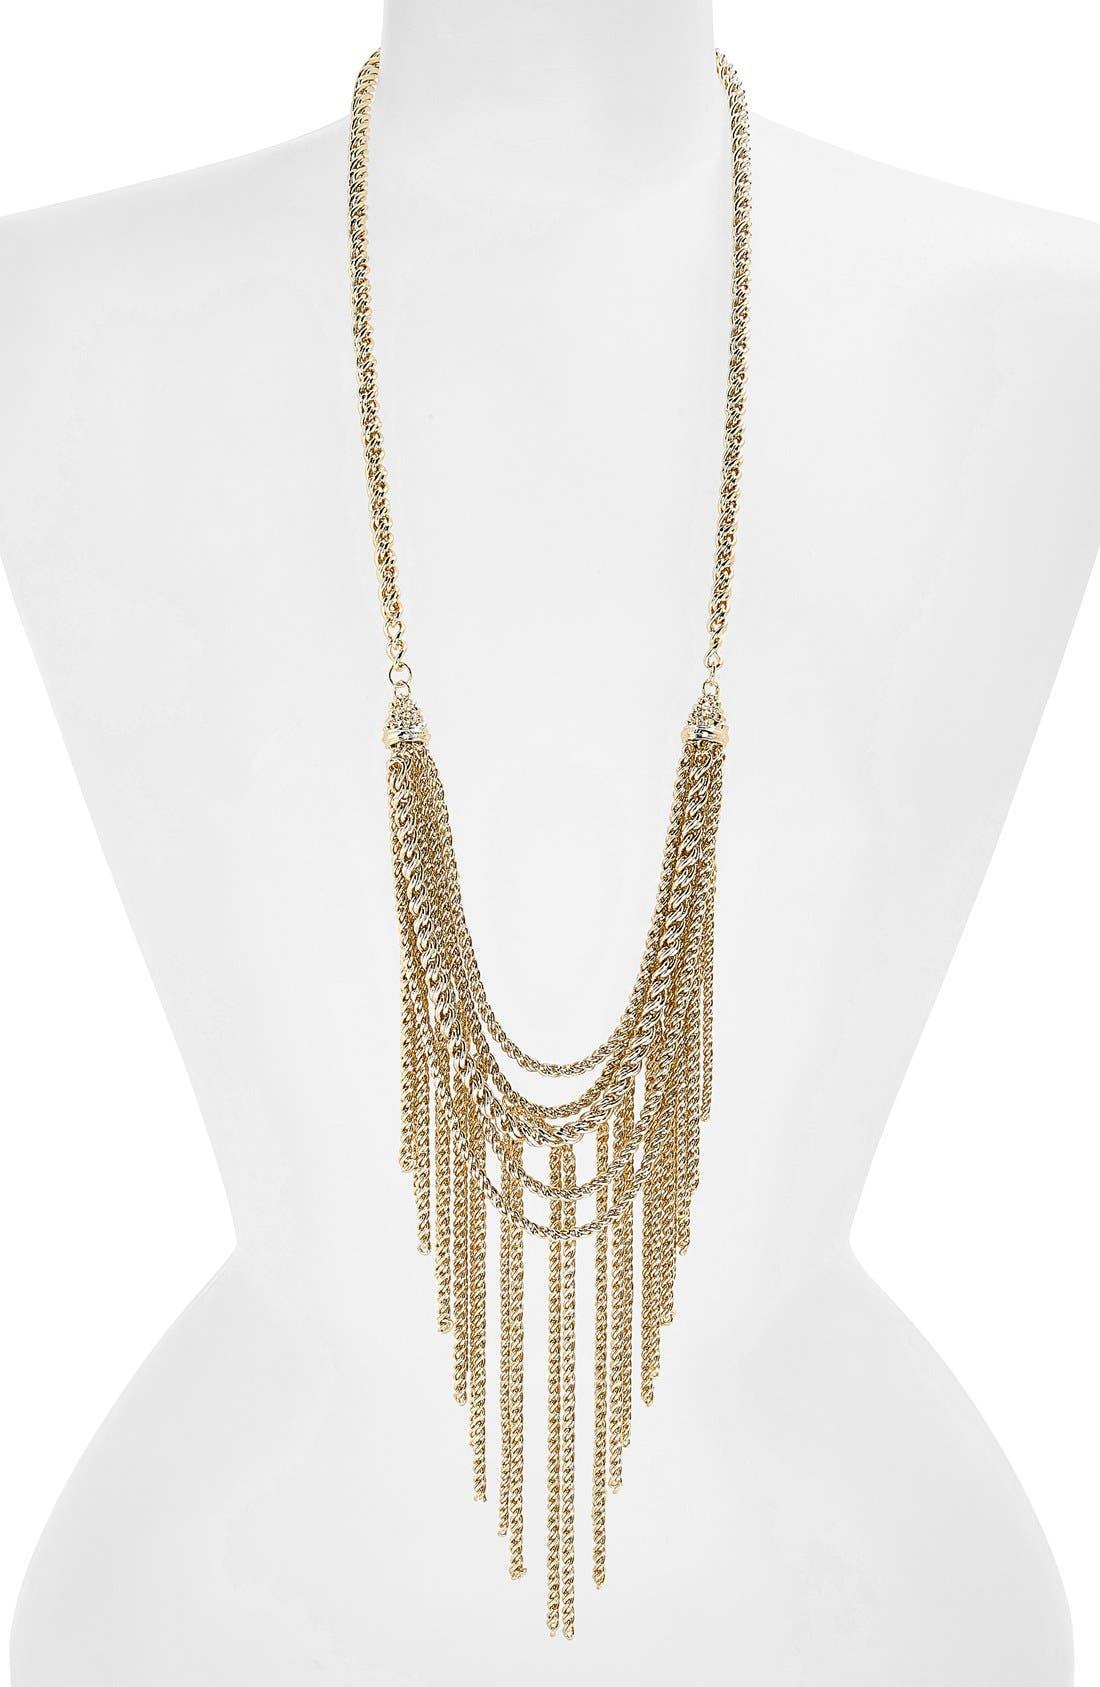 Alternate Image 1 Selected - Kendra Scott 'Landry' Long Chain Fringed Necklace